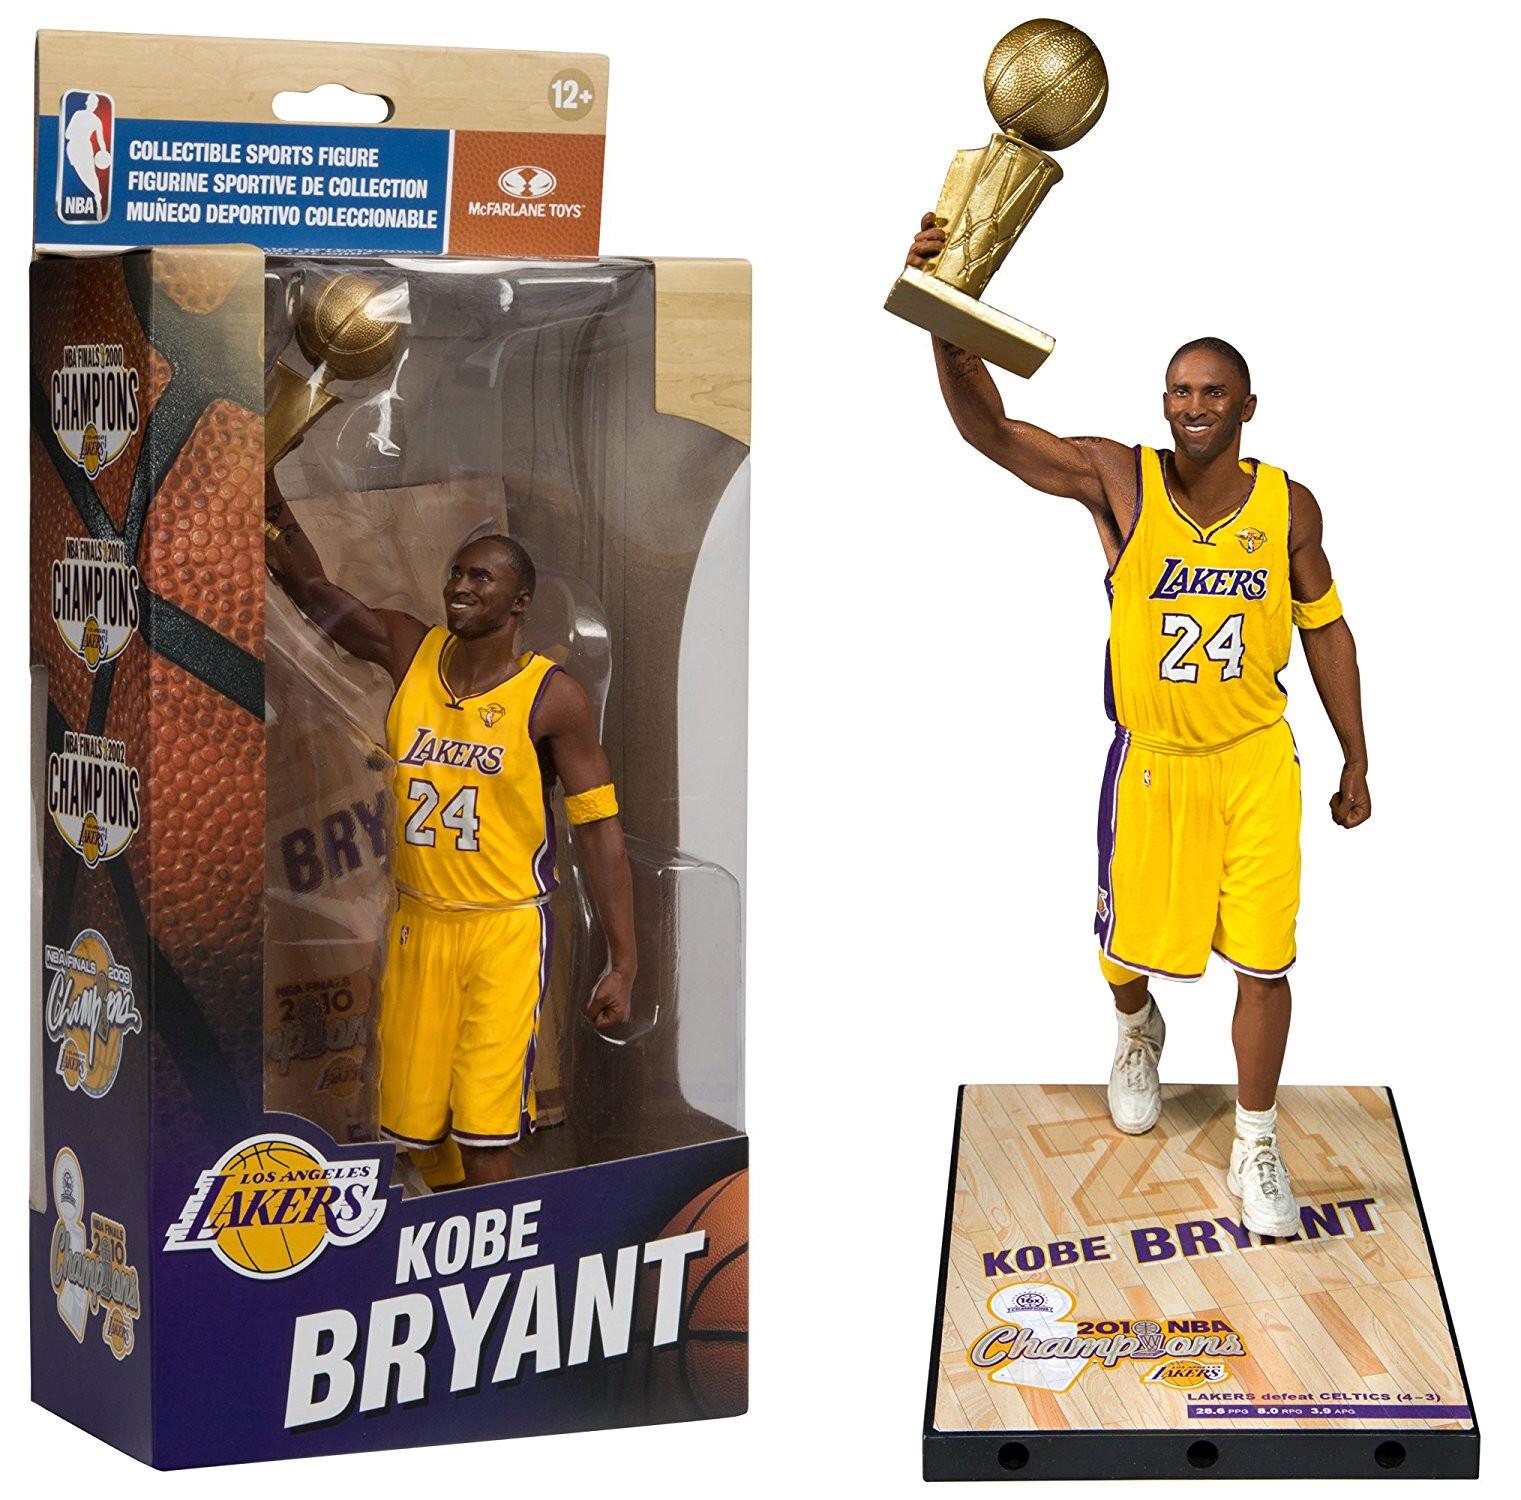 McFarlane Toys NBA  KOBE BRYANT (2010) FIGURE  Limited Ed. Championship Series